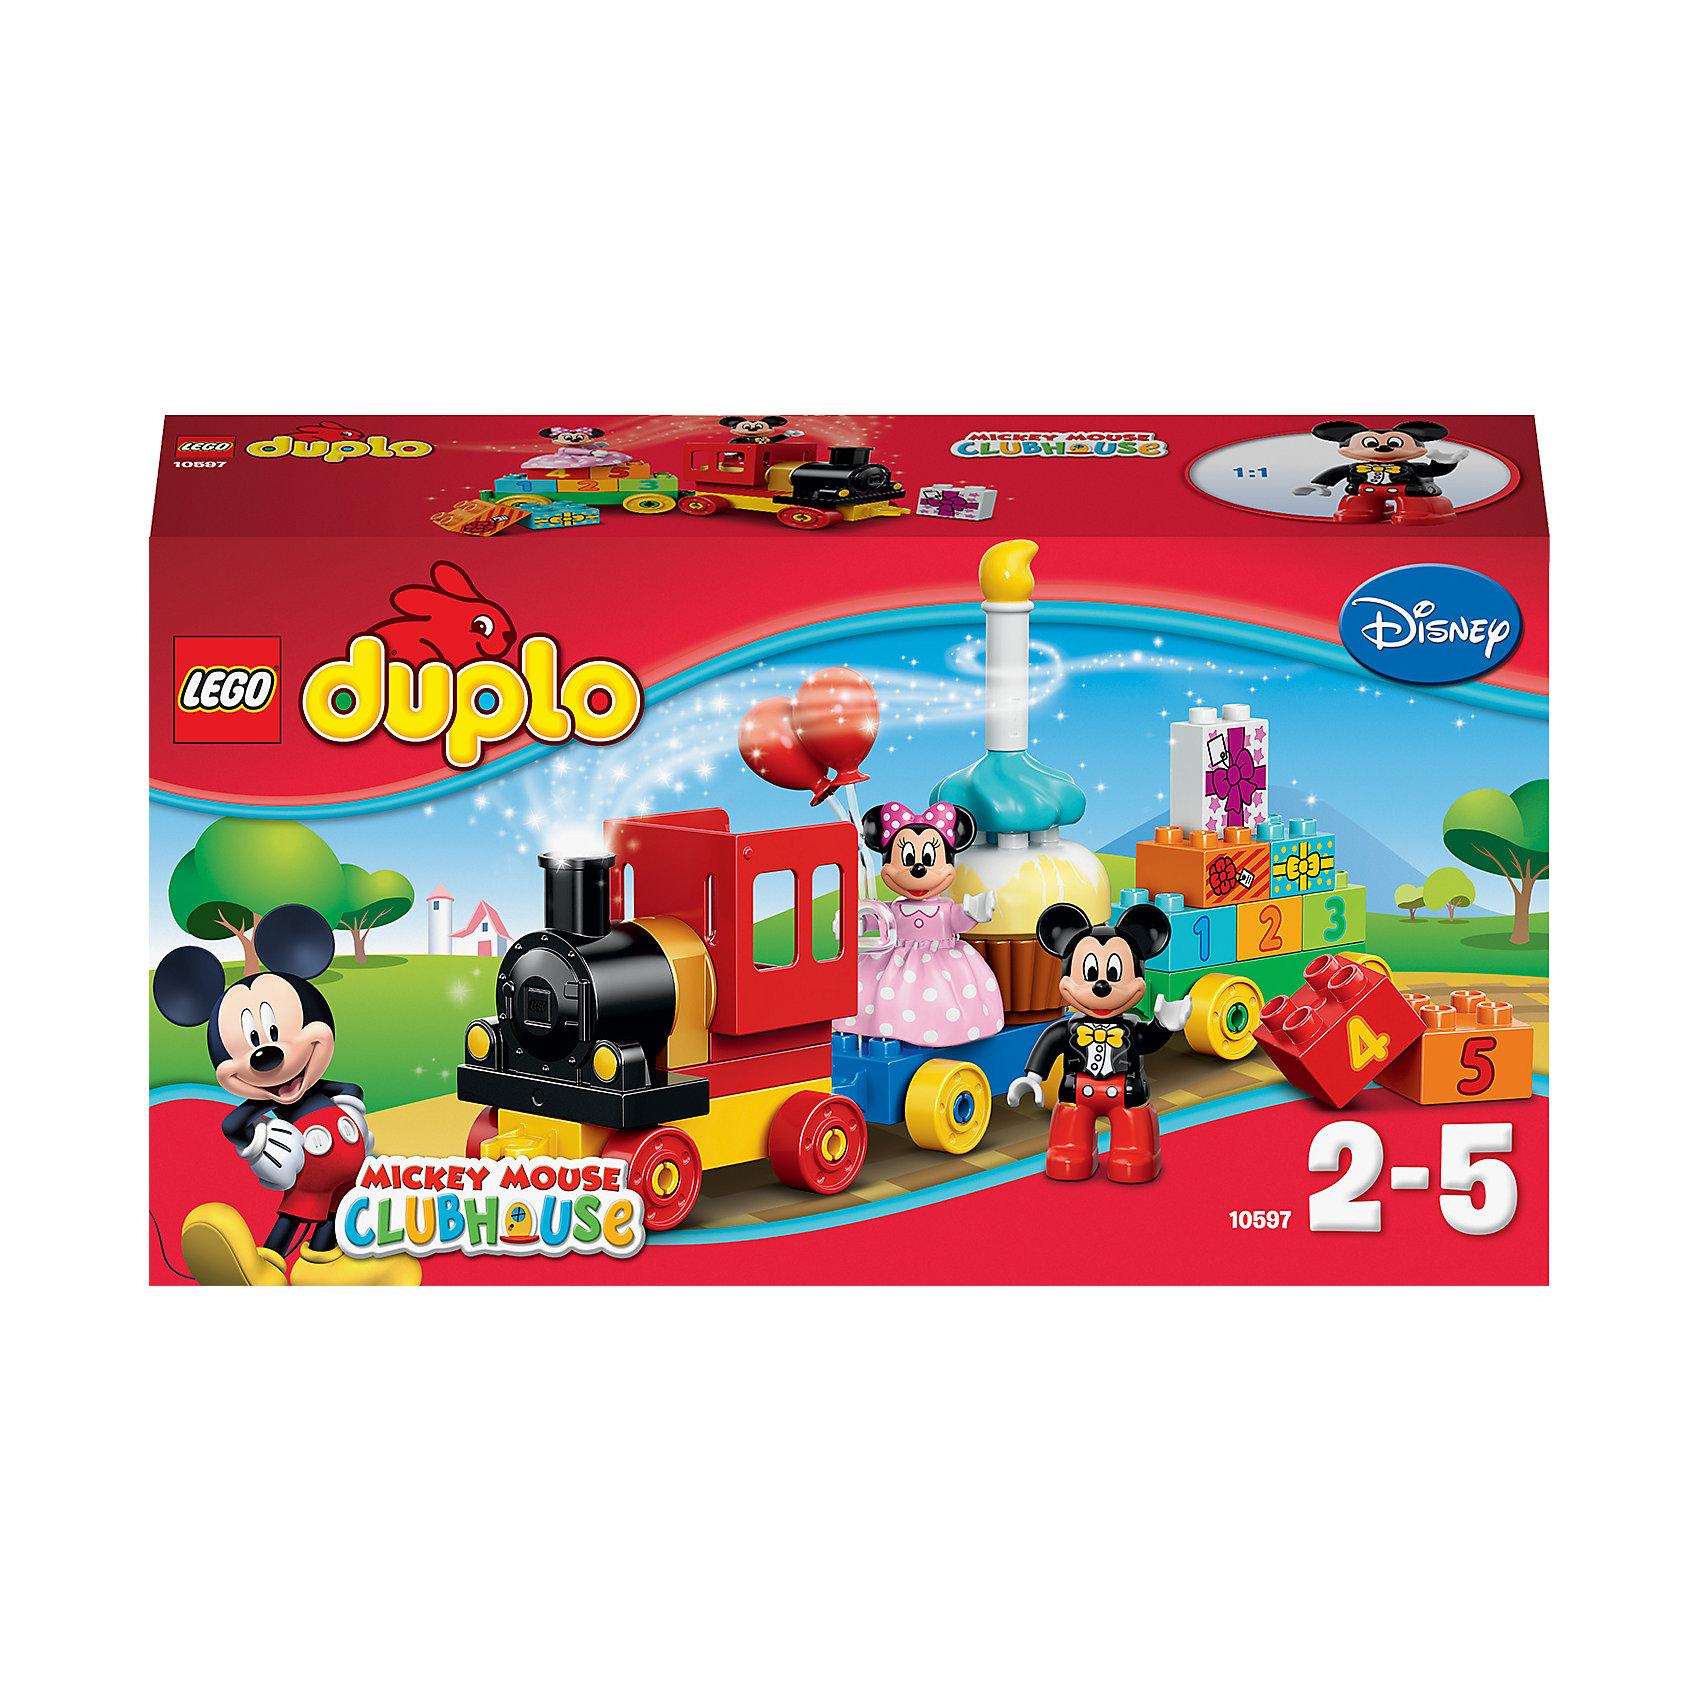 LEGO LEGO DUPLO 10597: День рождения с Микки и Минни